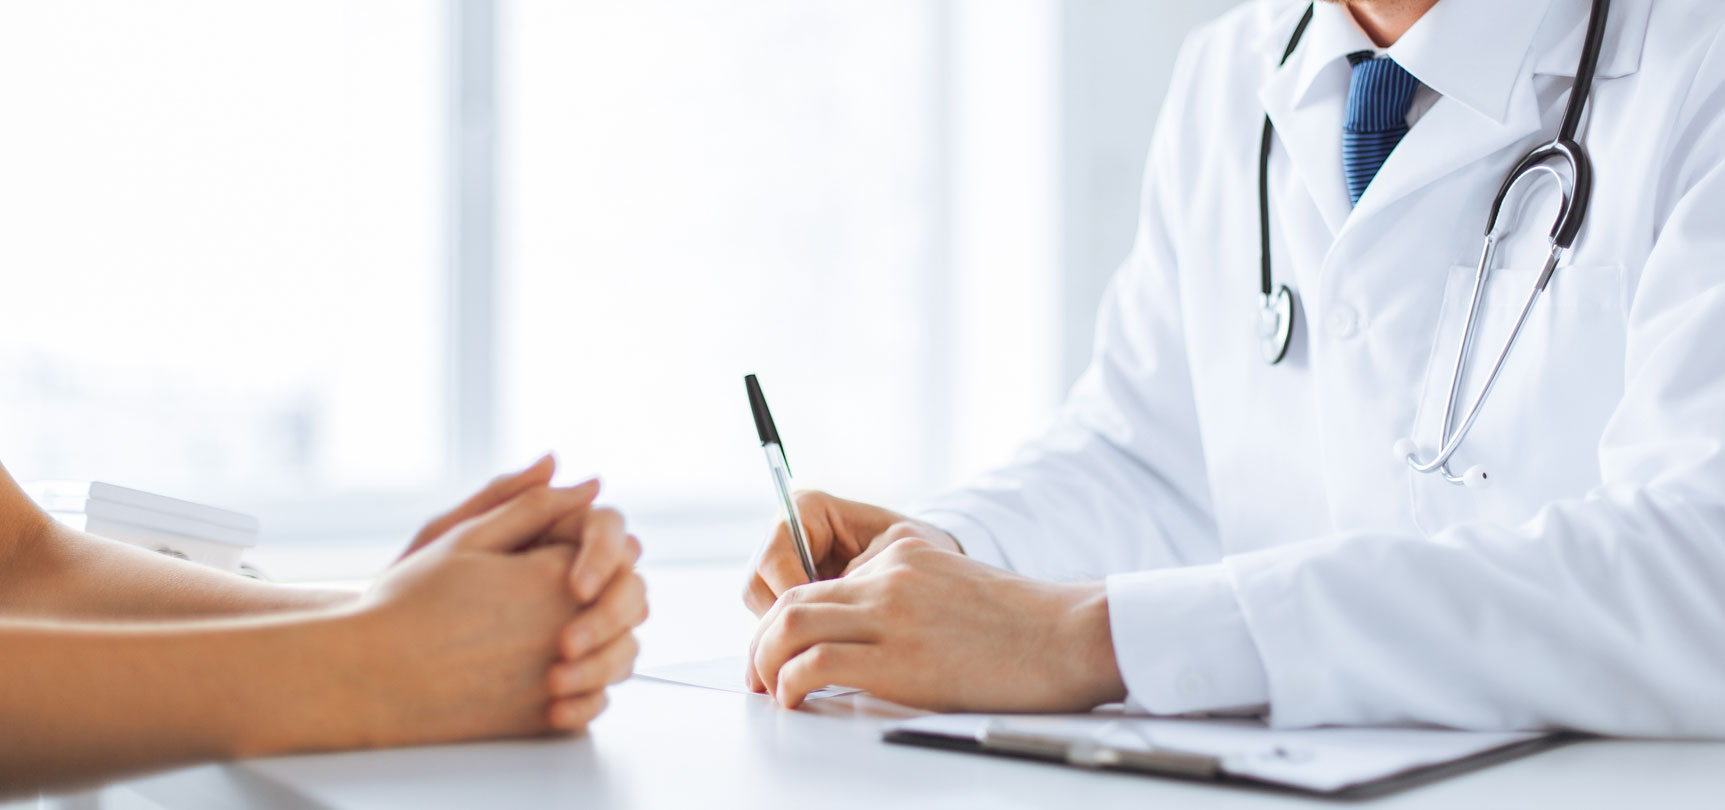 Cuidados após procedimento de Excisão Cirurgica na Pele - Dermatologista Curitiba - Clínica CMP